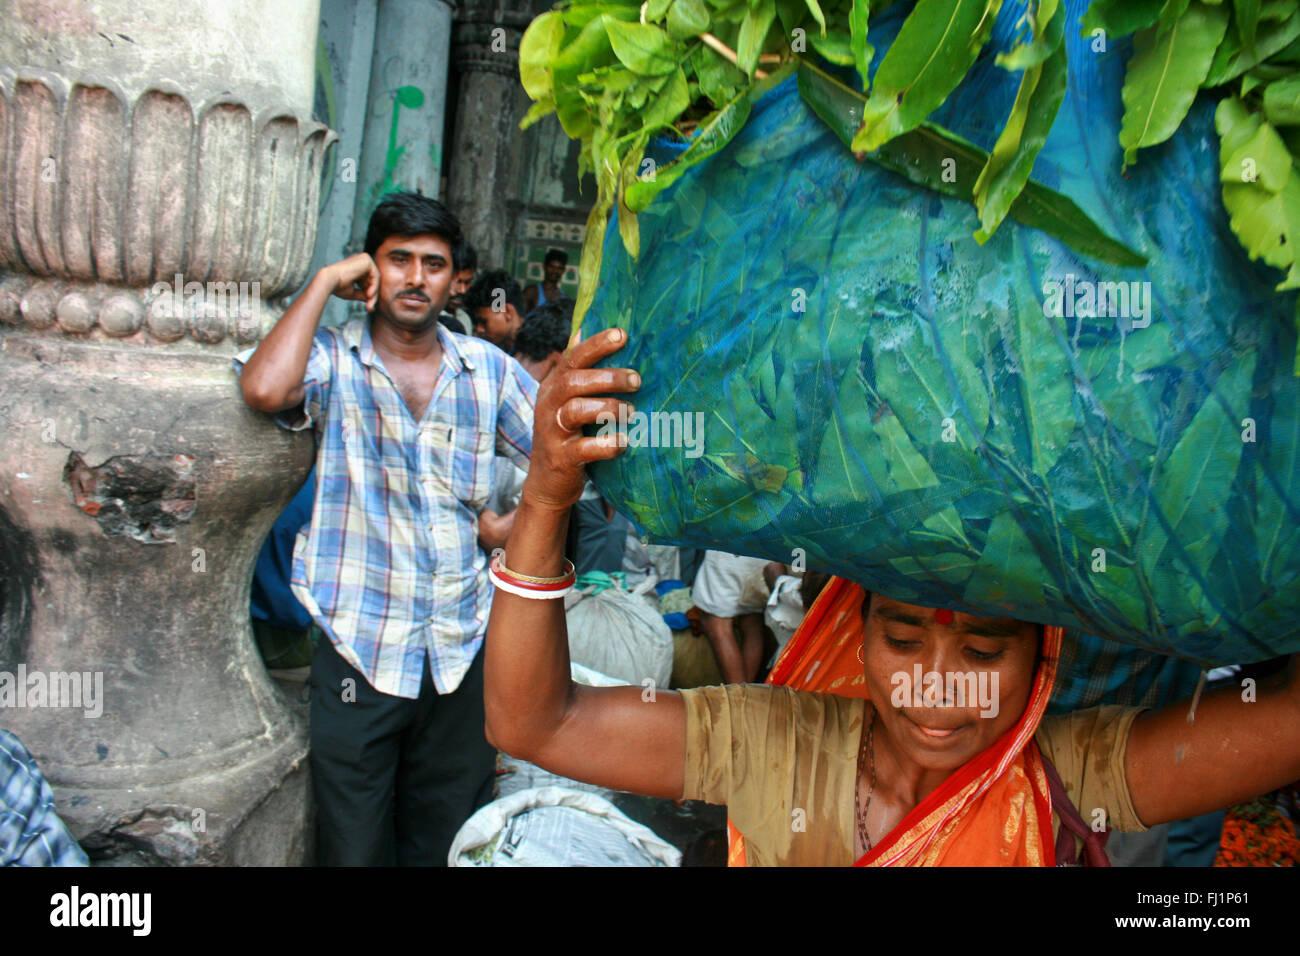 Woman carrying heavy bag - hard working at Kolkata flower market , India. A man is watching . - Stock Image